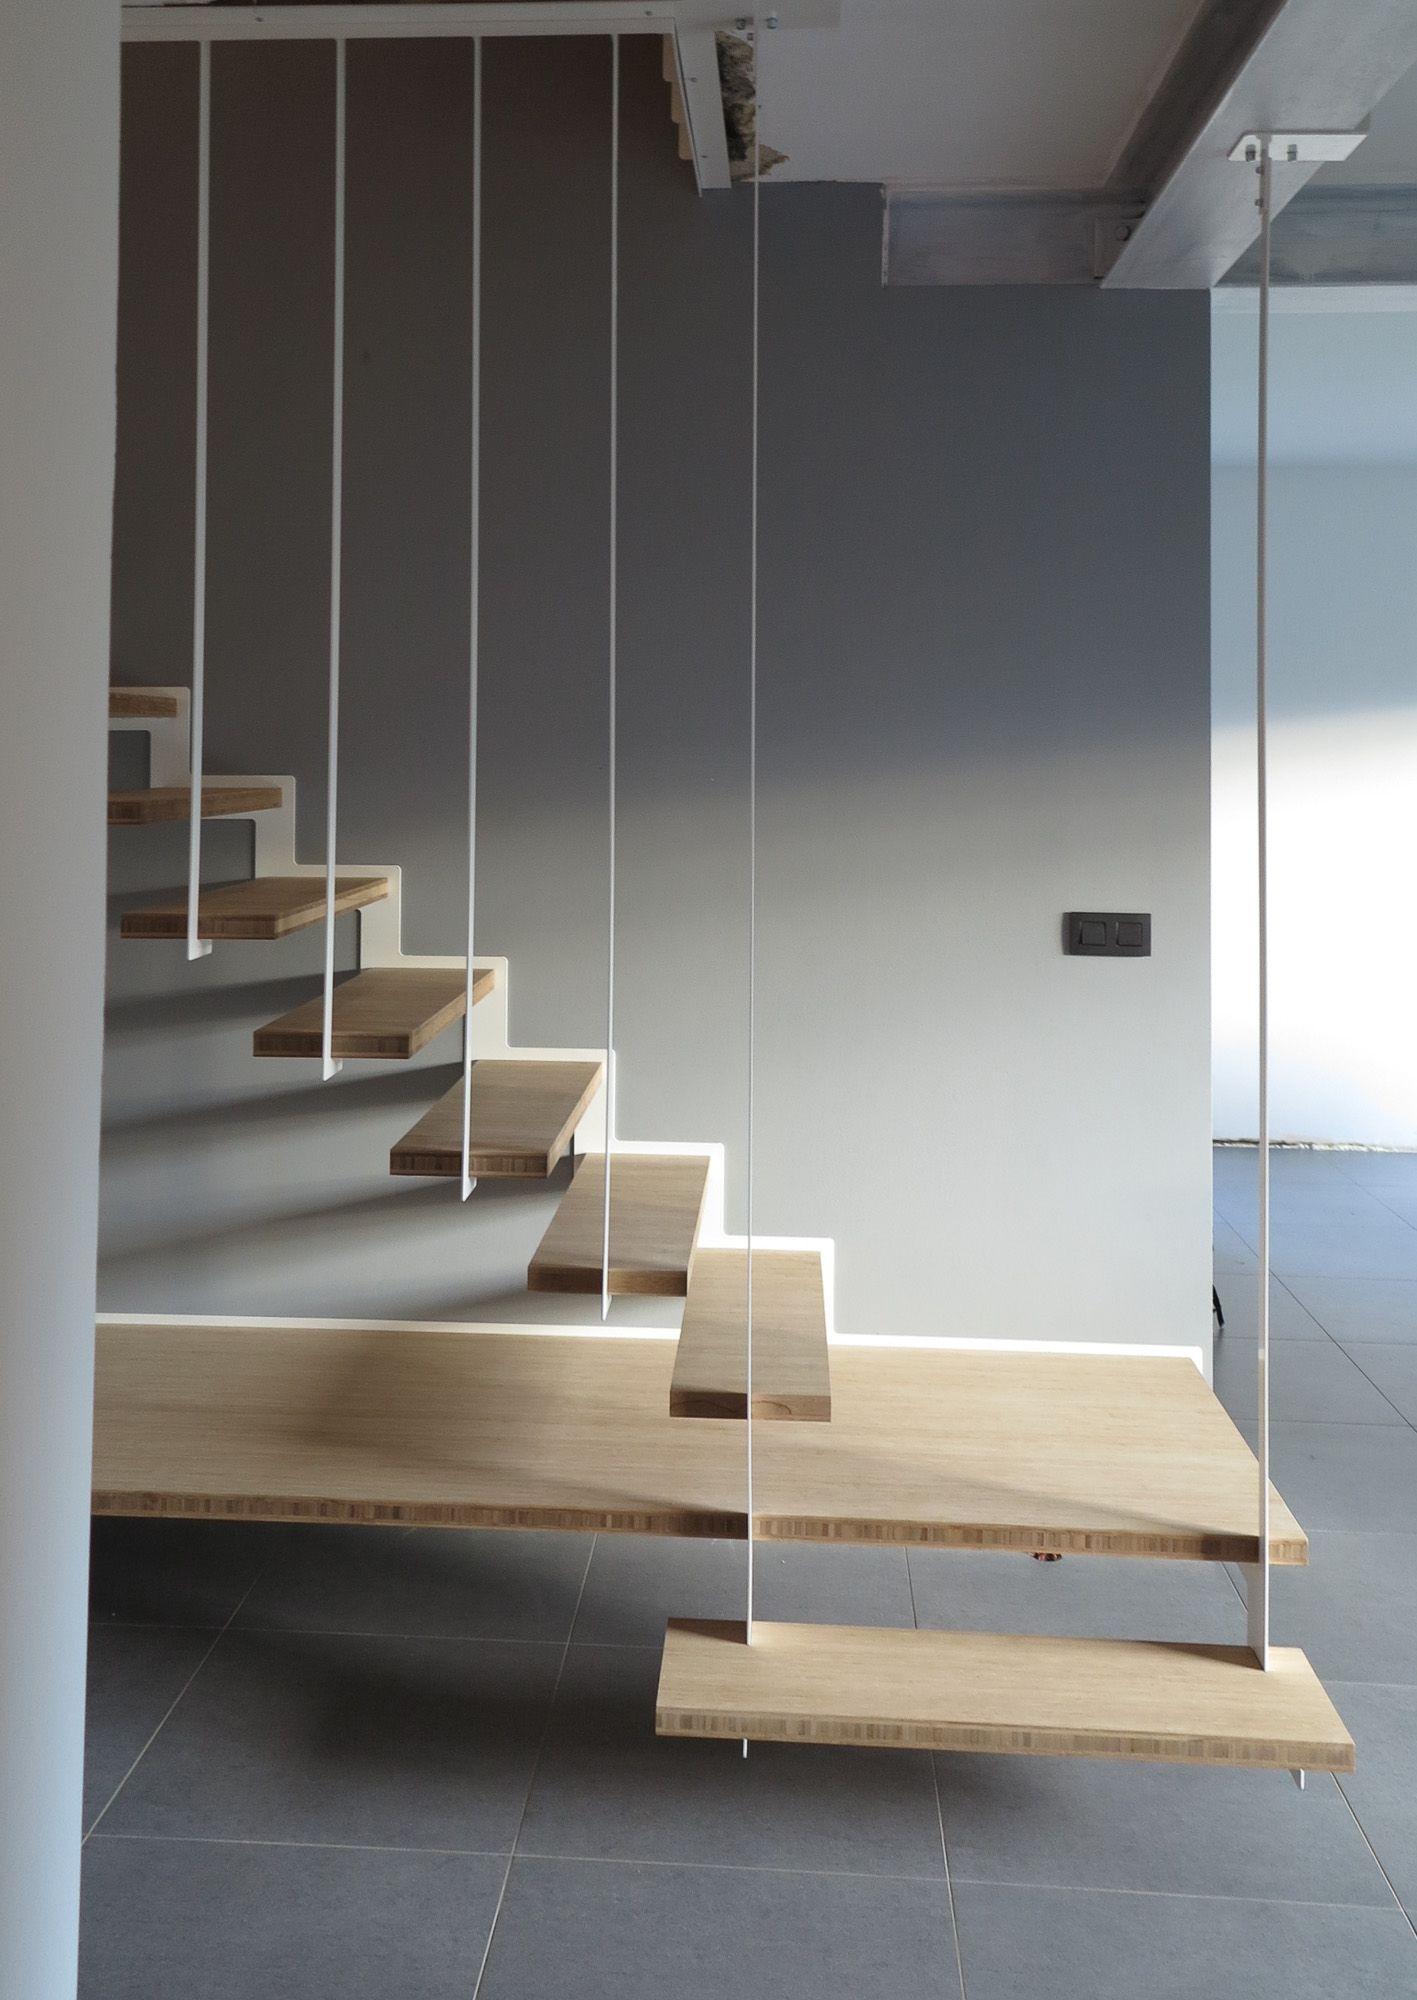 Best Suspended Stairs Detail Google Search Design De Casa Moderno Arquitetura Escadas Escadas 400 x 300